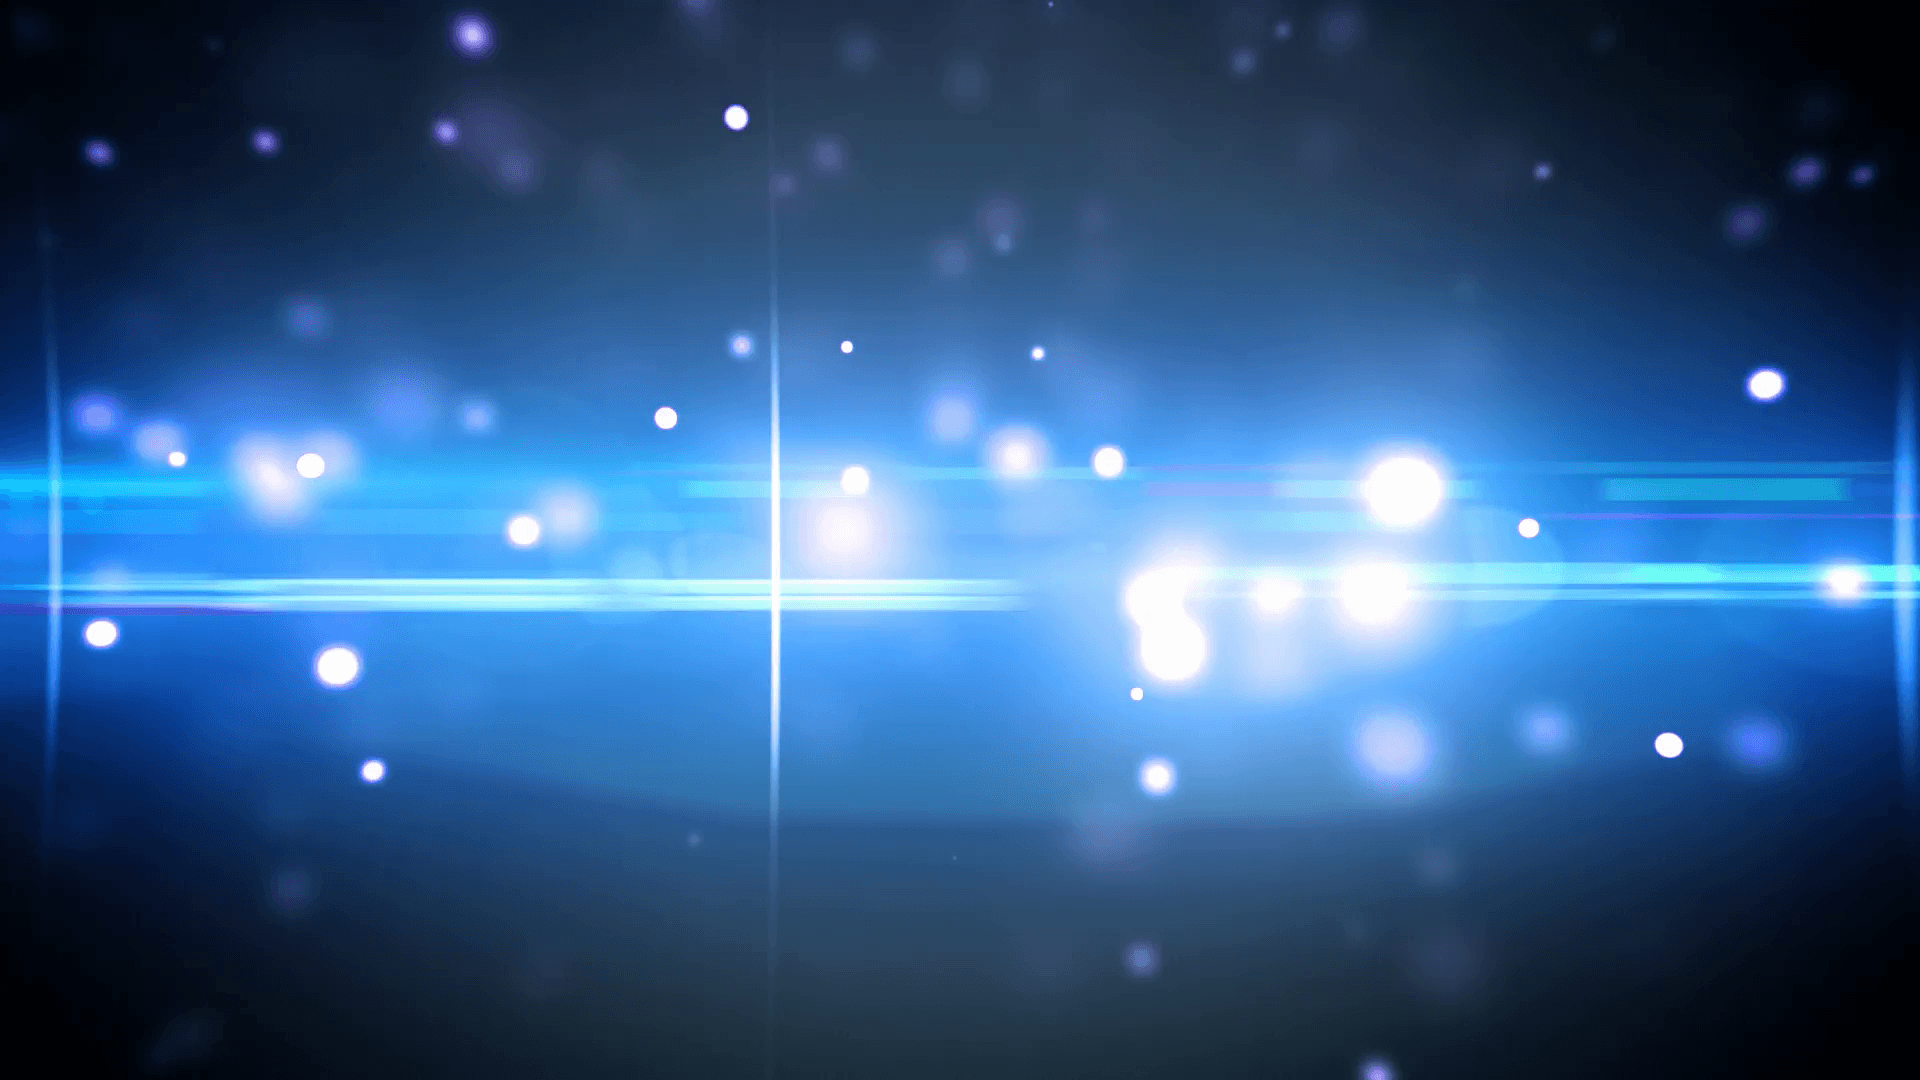 Light Effect Hd Wallpaper Background Images